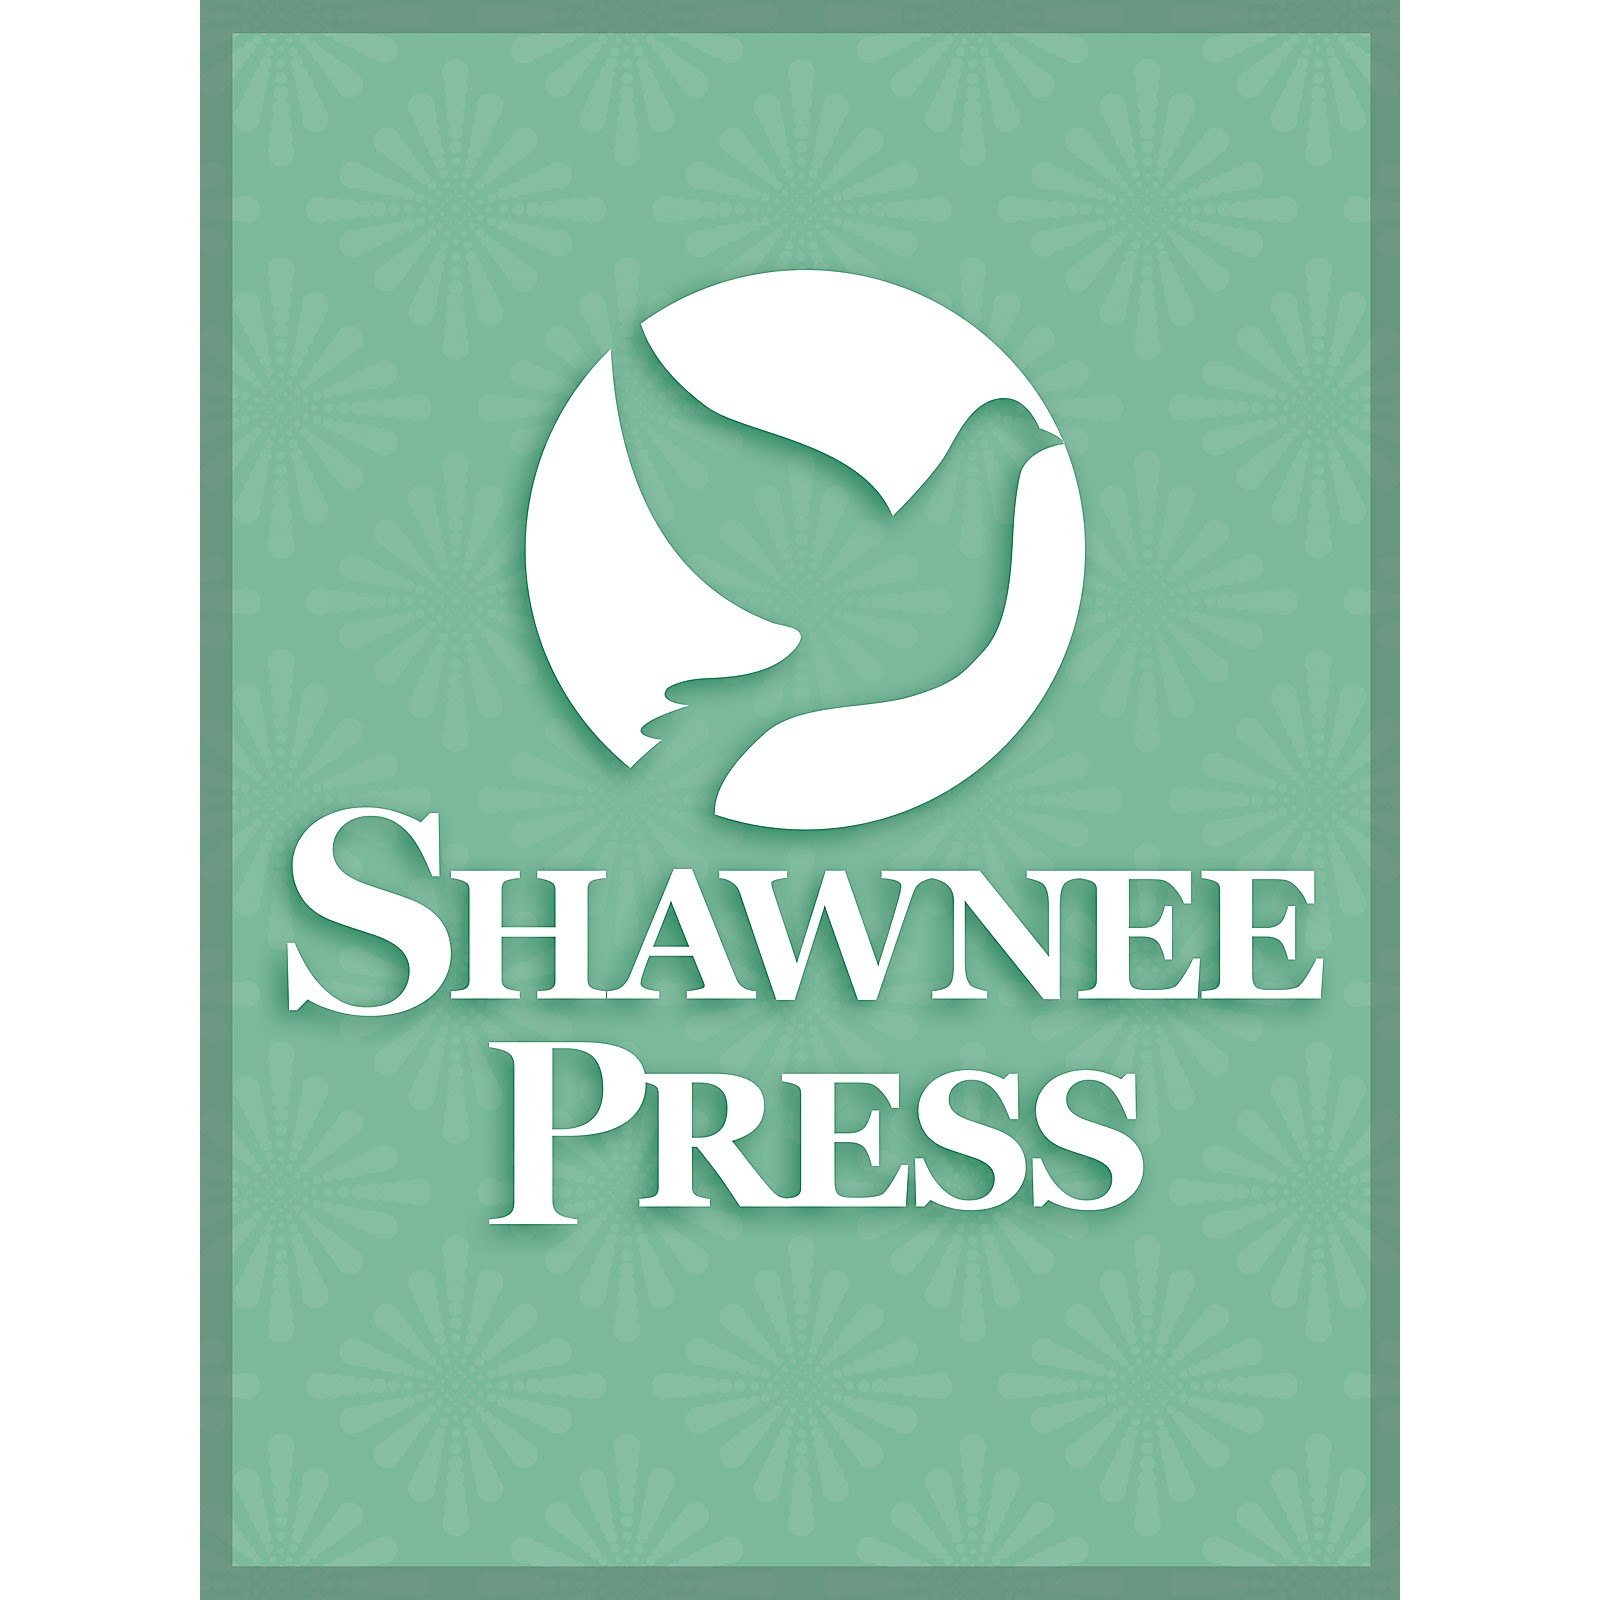 Shawnee Press Song of Stewardship, A (SATB) SATB Arranged by Taulman